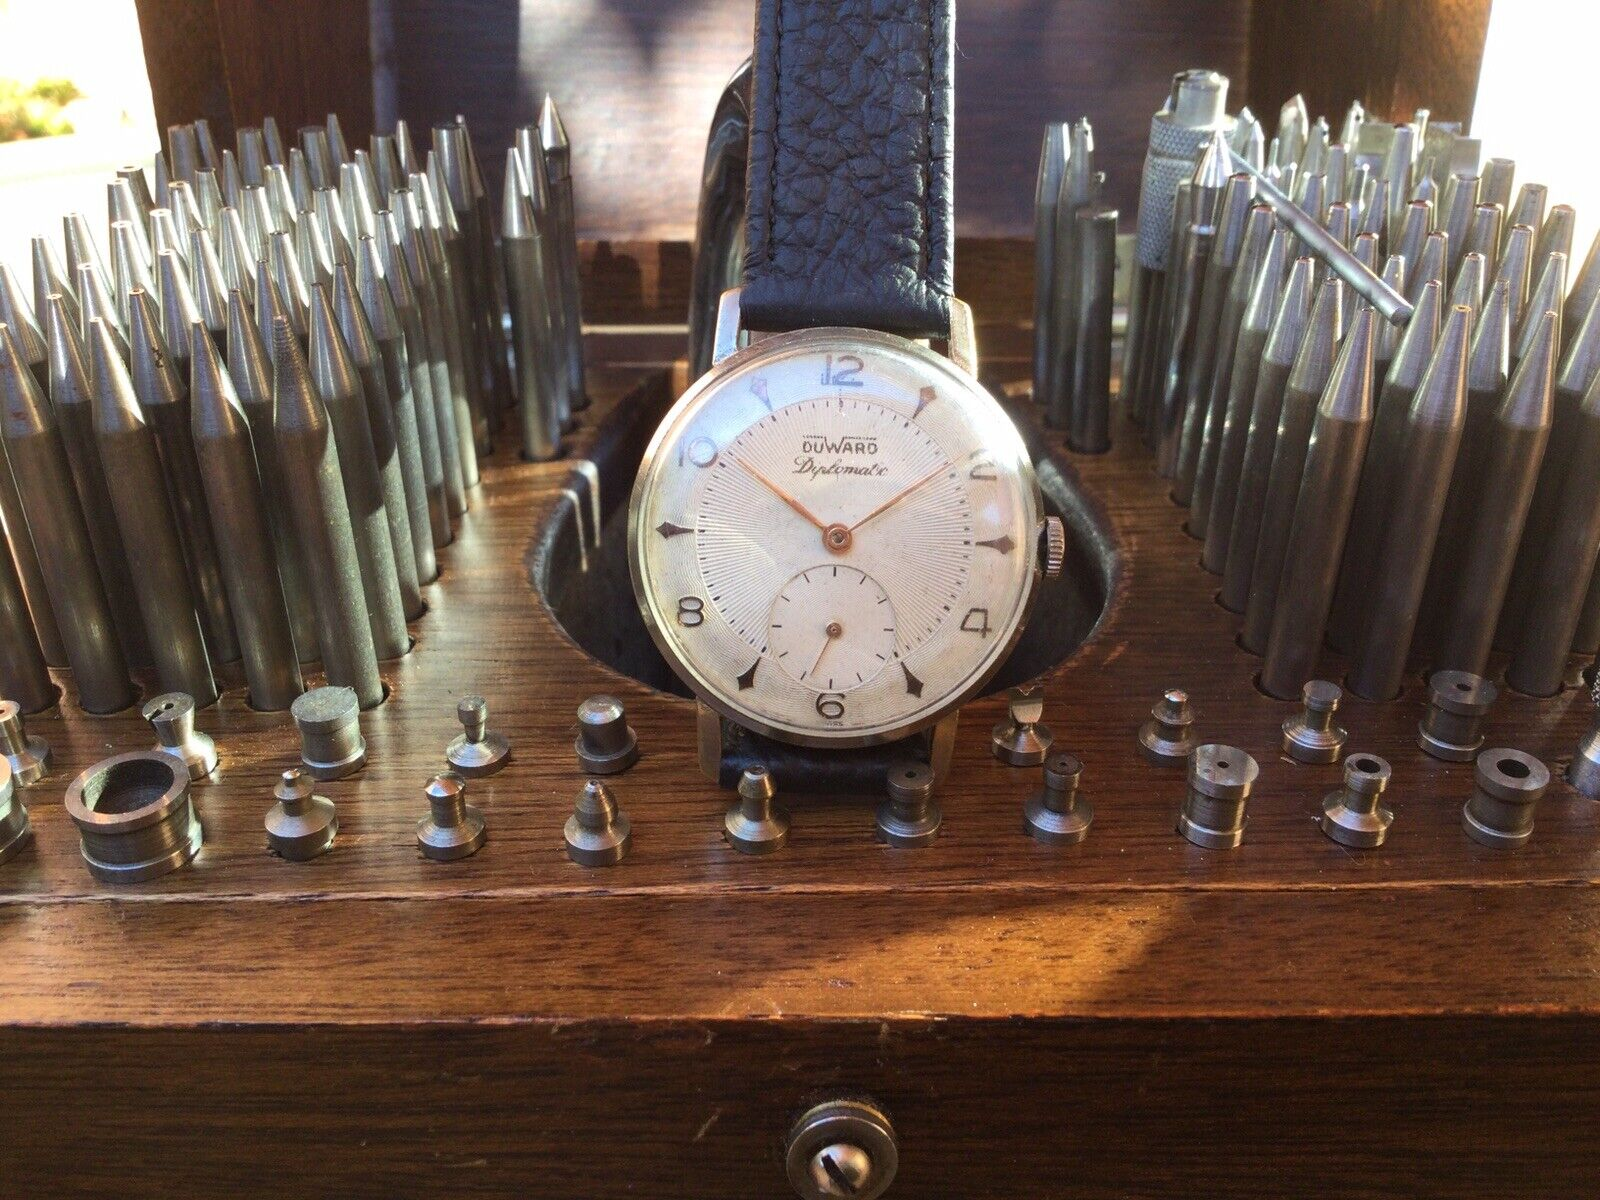 Duward Diplomatic. Duward 171 (base Unitas 176). Reloj Vintage. In Working Order